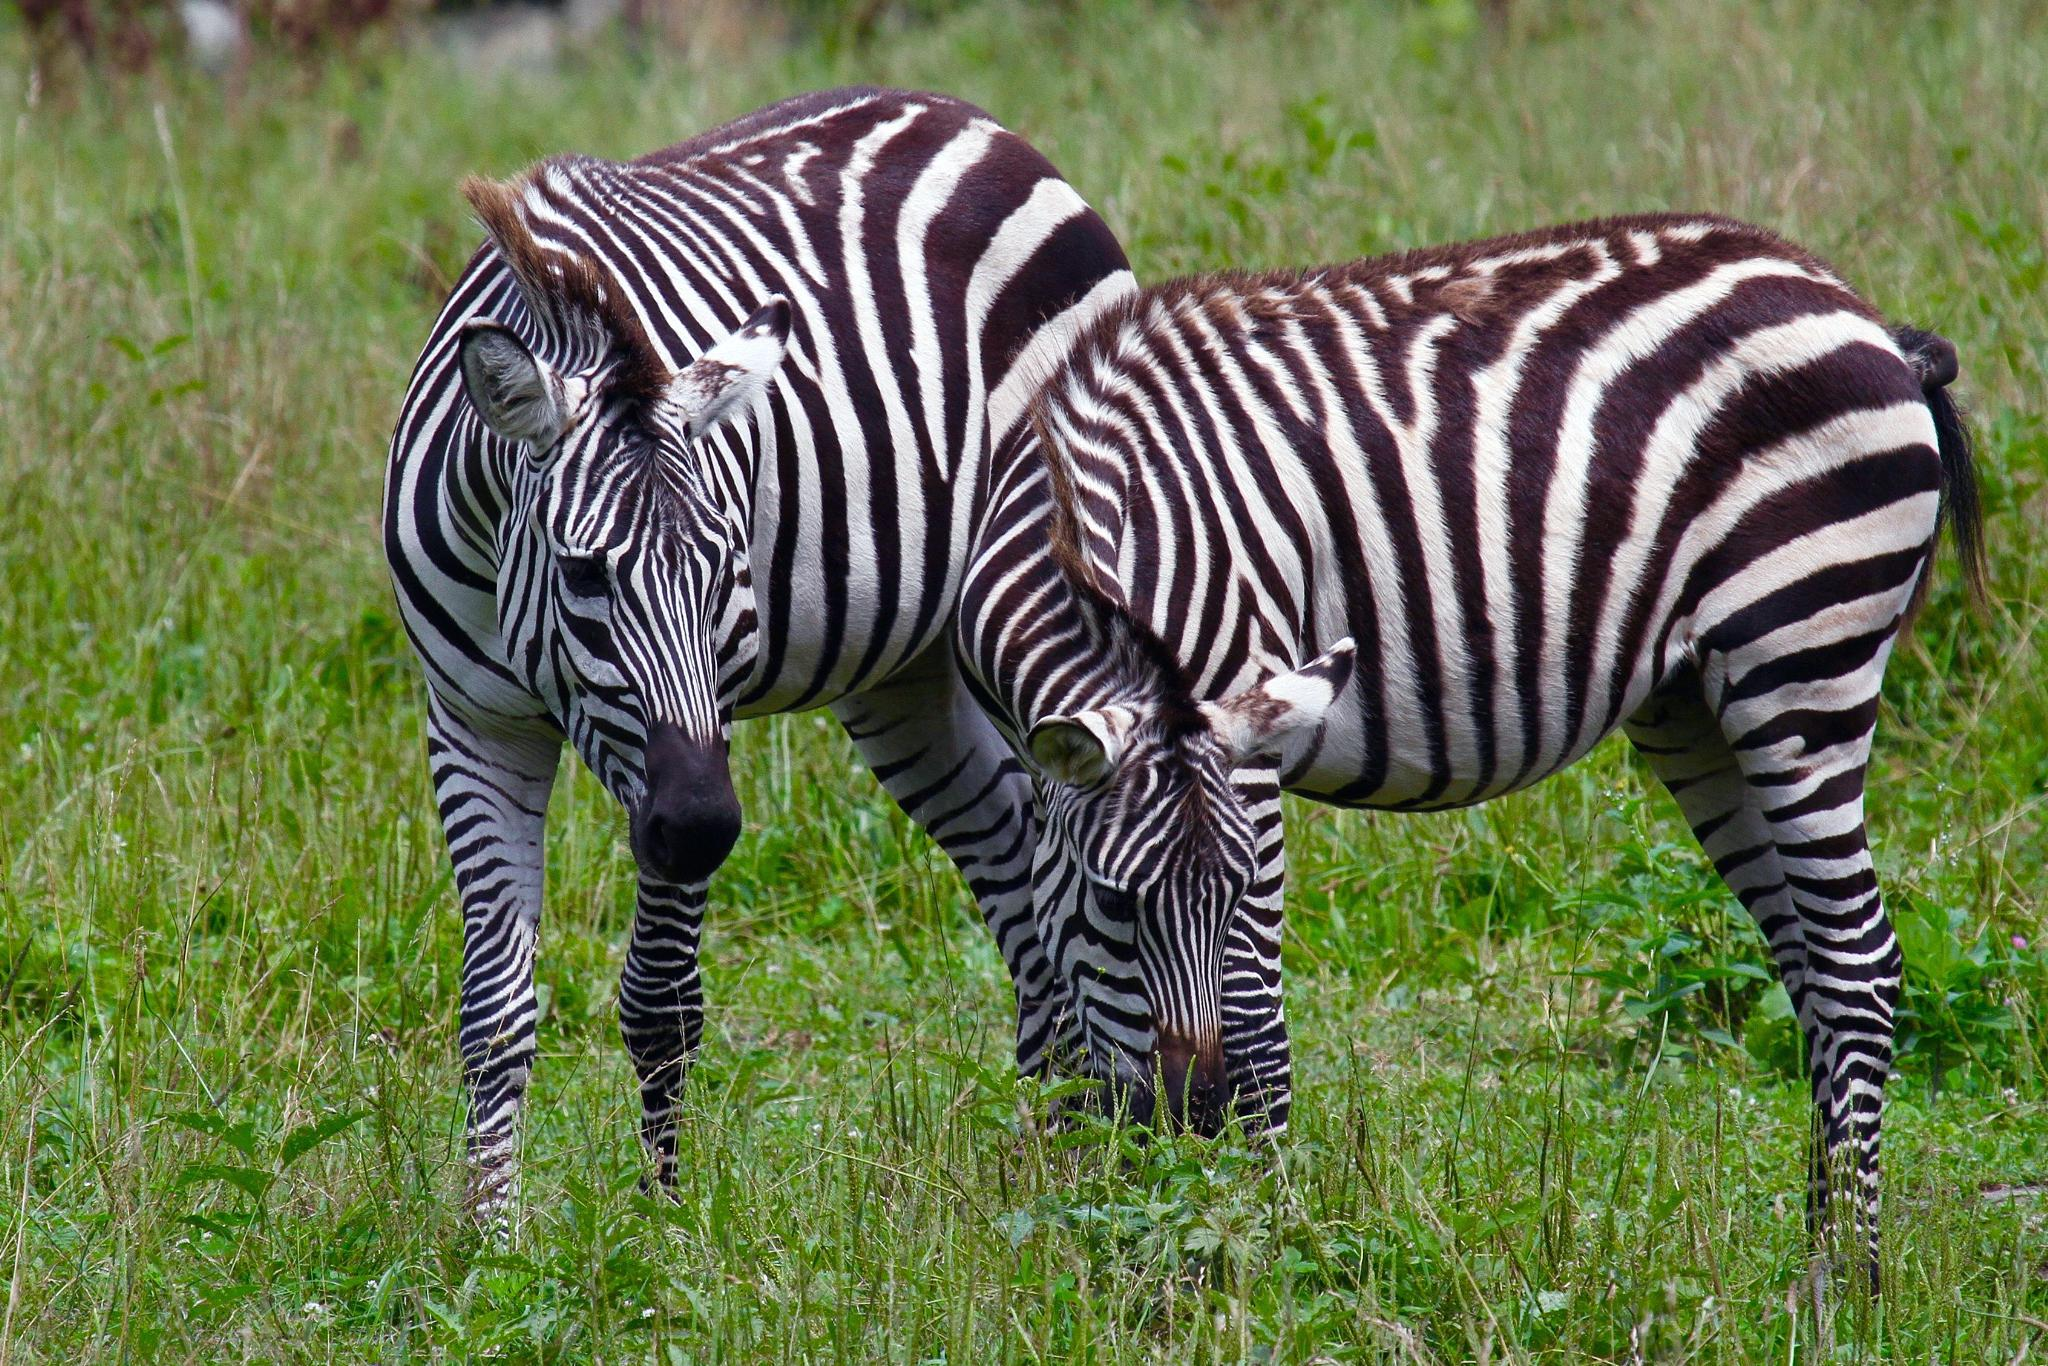 Zebras by Jason R. Rich